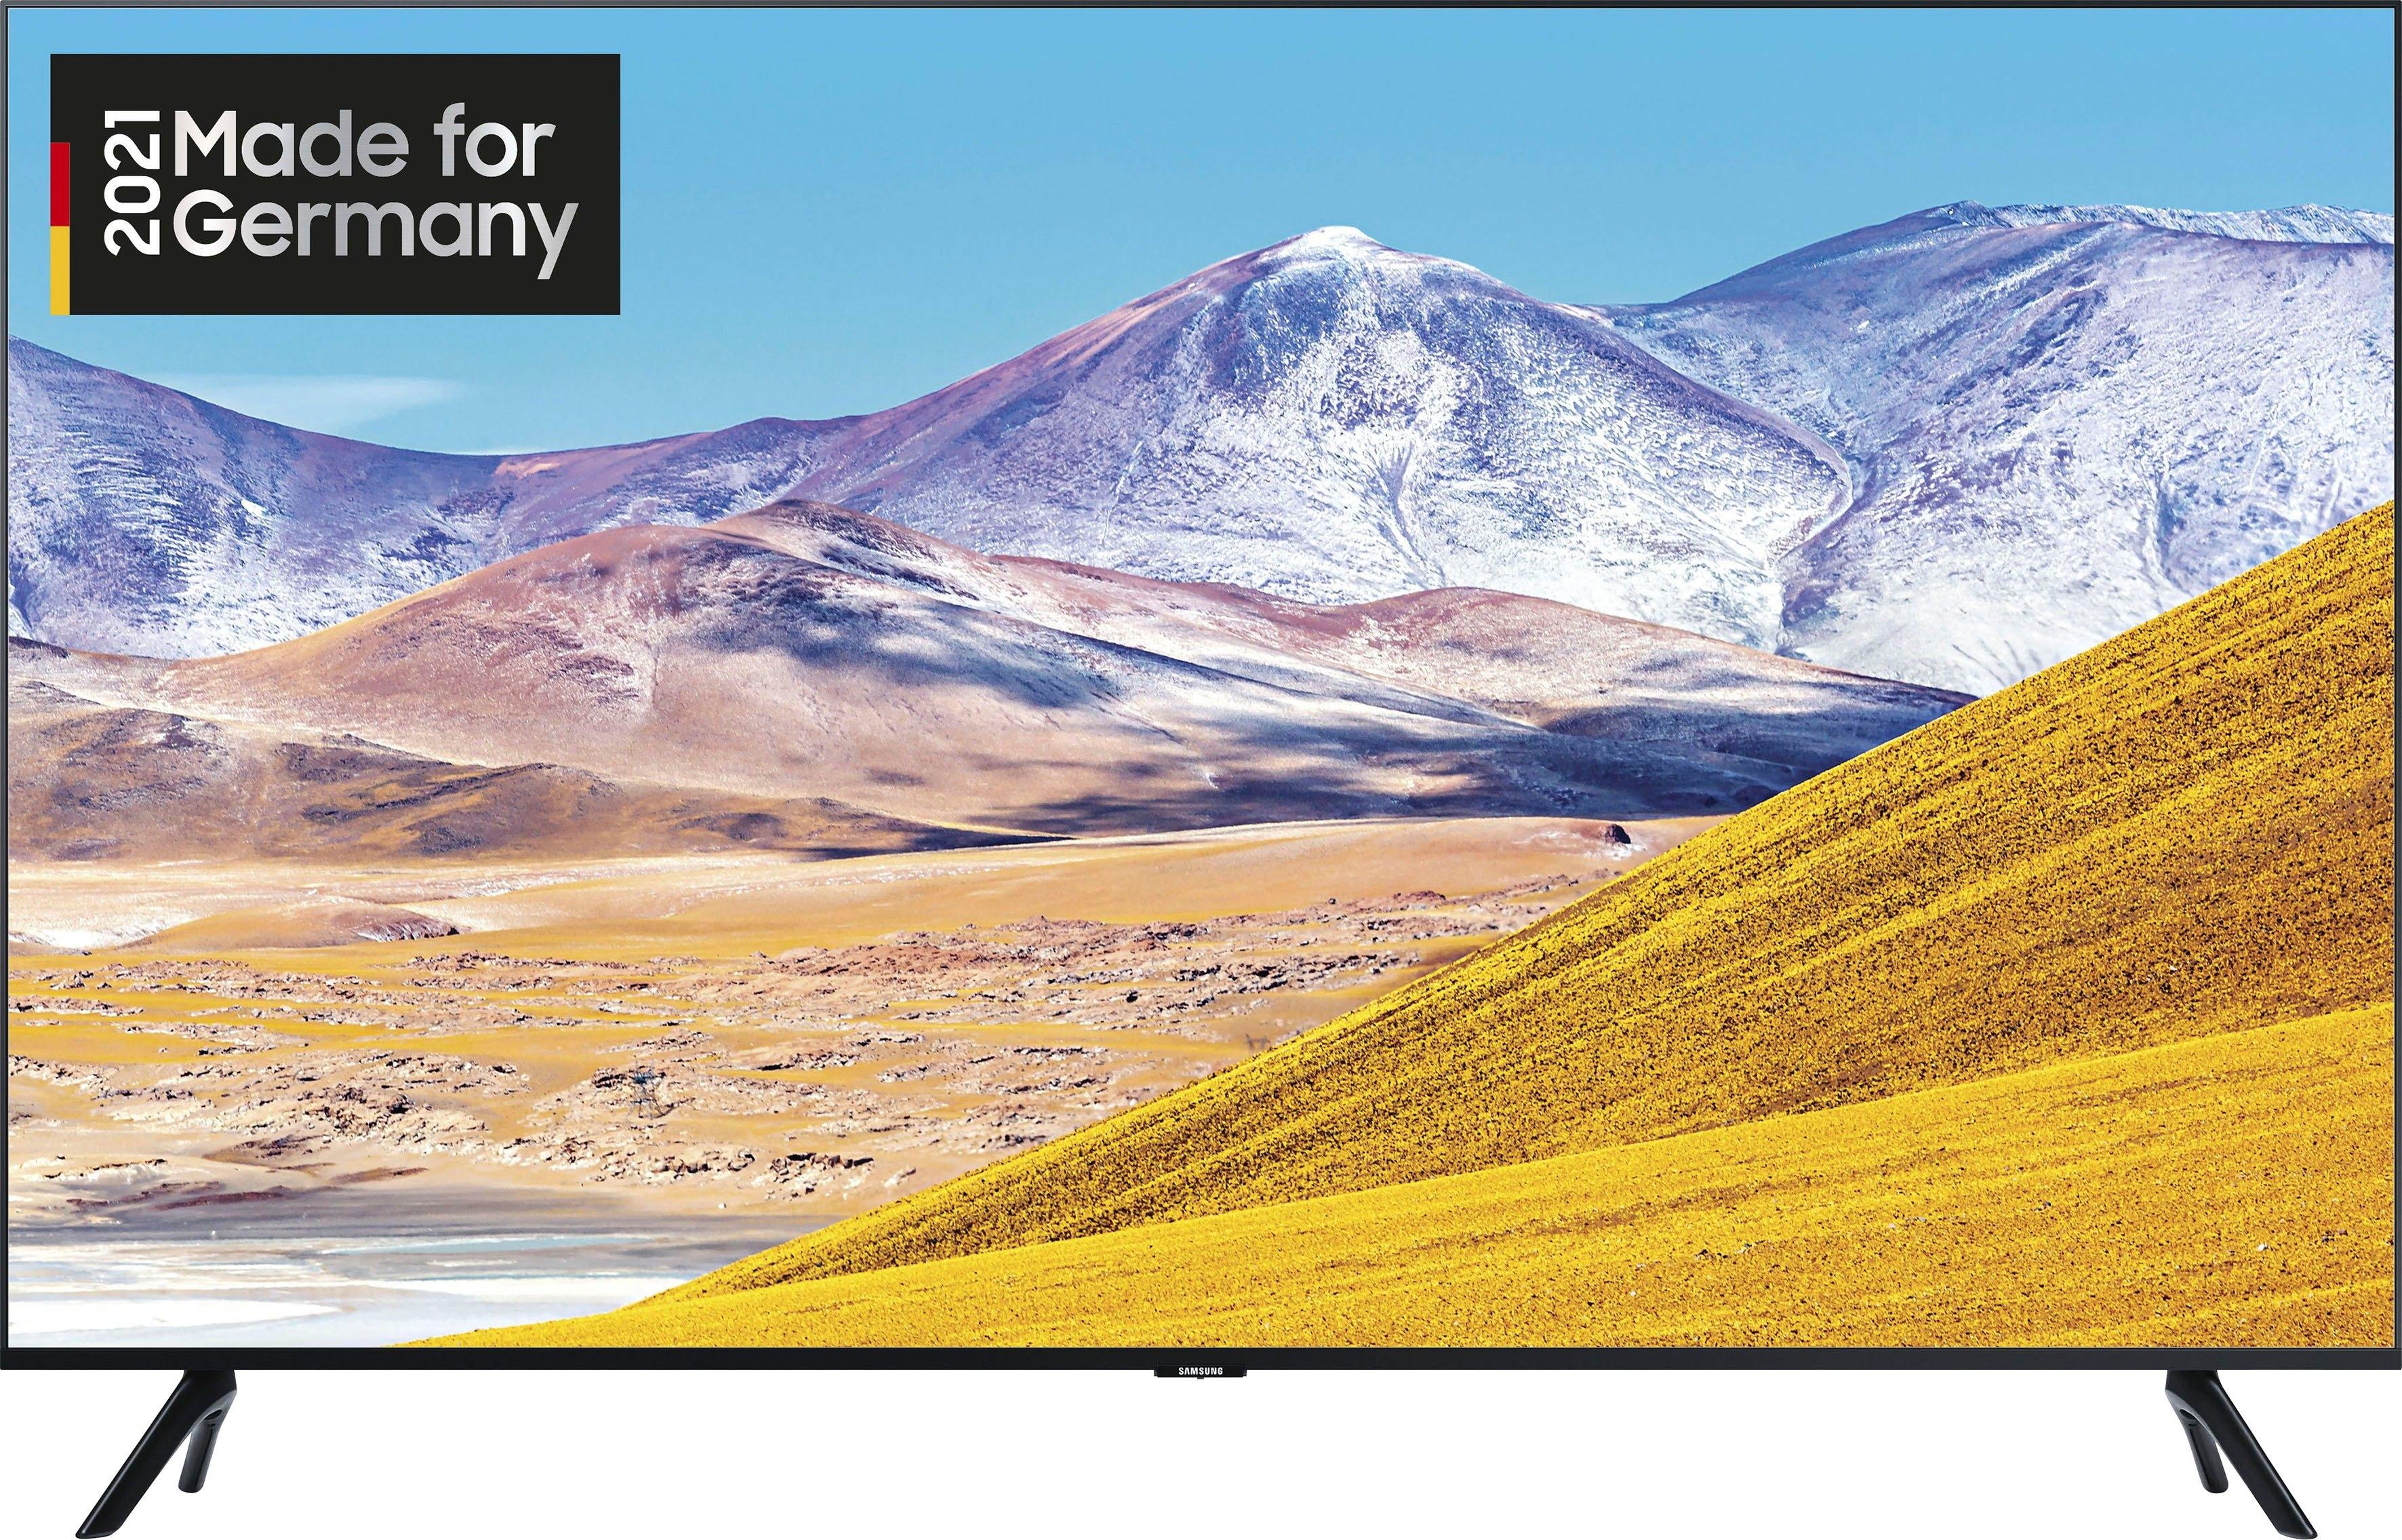 Samsung LED-TV GU65TU8079U, 163 cm / 65